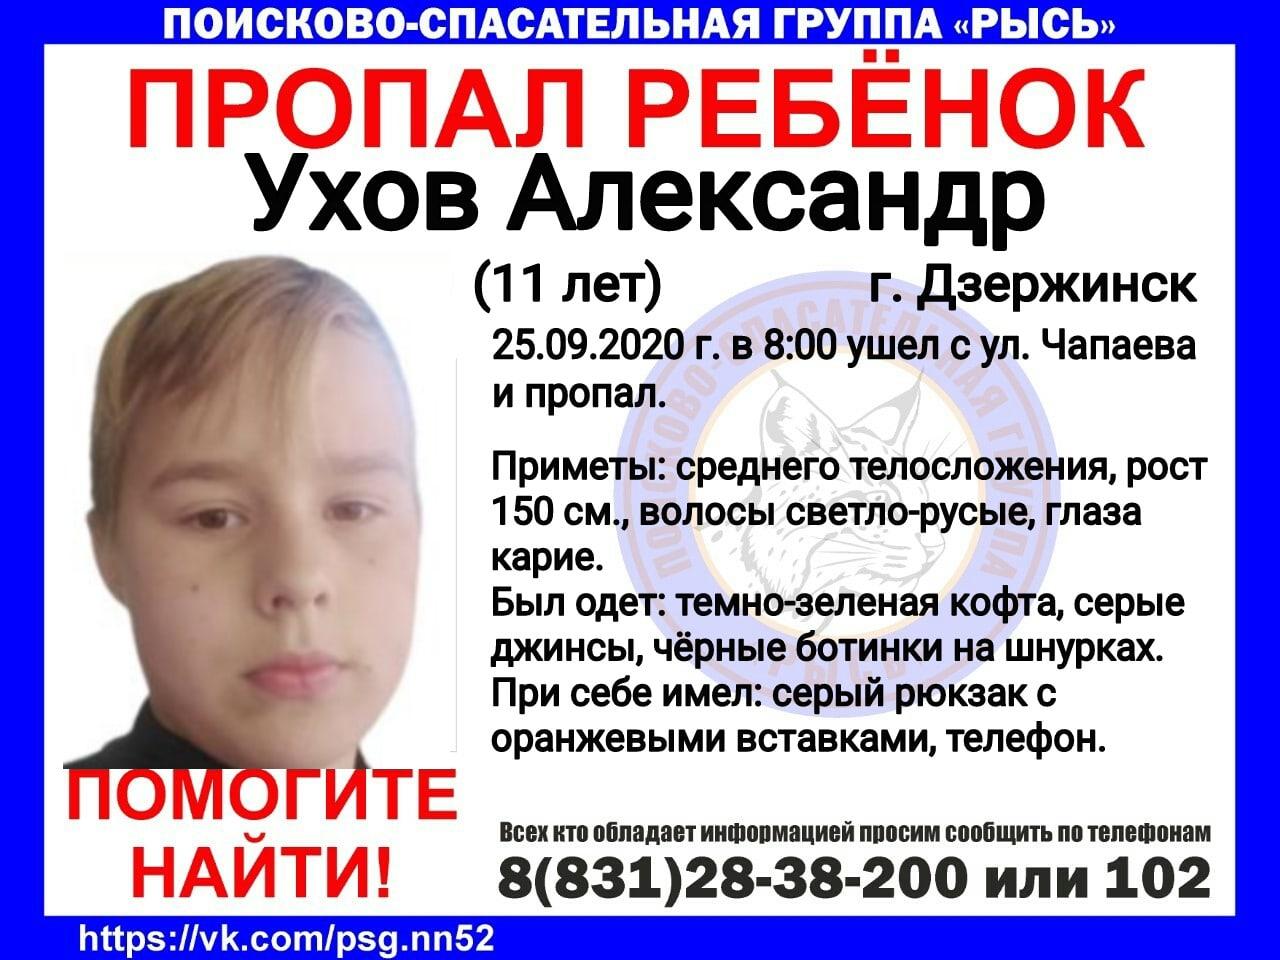 Ухов Александр, 11 лет, г. Дзержинск